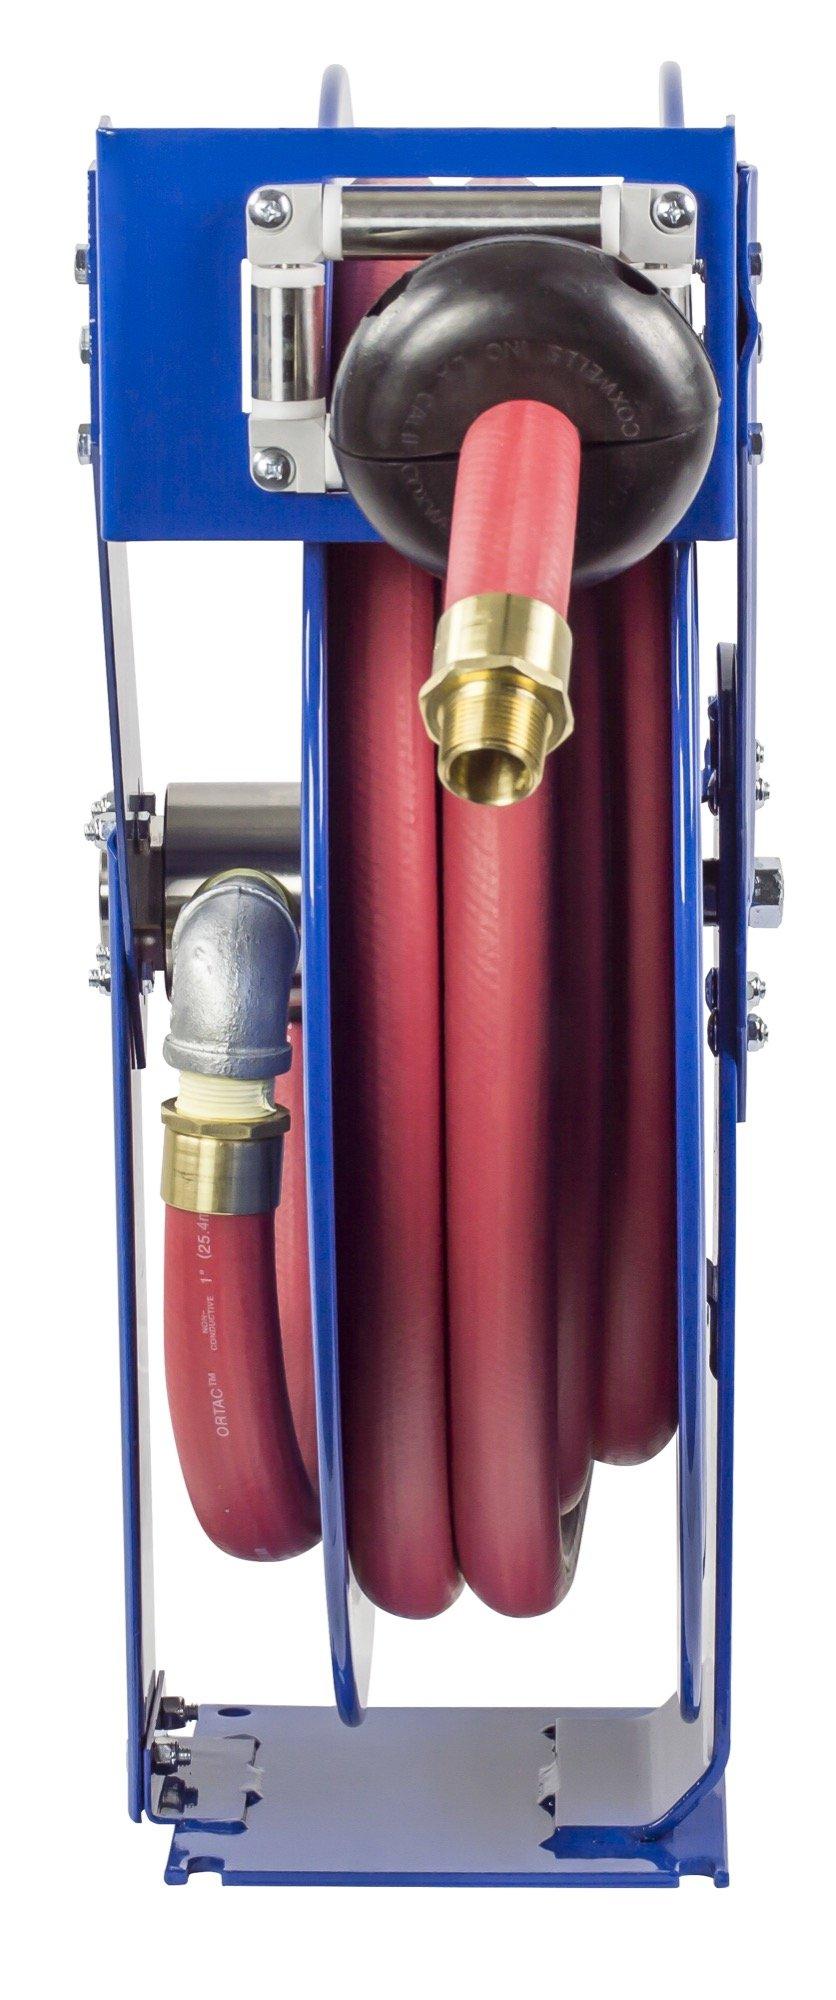 Coxreels EZ-TSHF-550 Safety System Spring Driven Fuel Hose Reel 3/4'' x 50' 300 psi